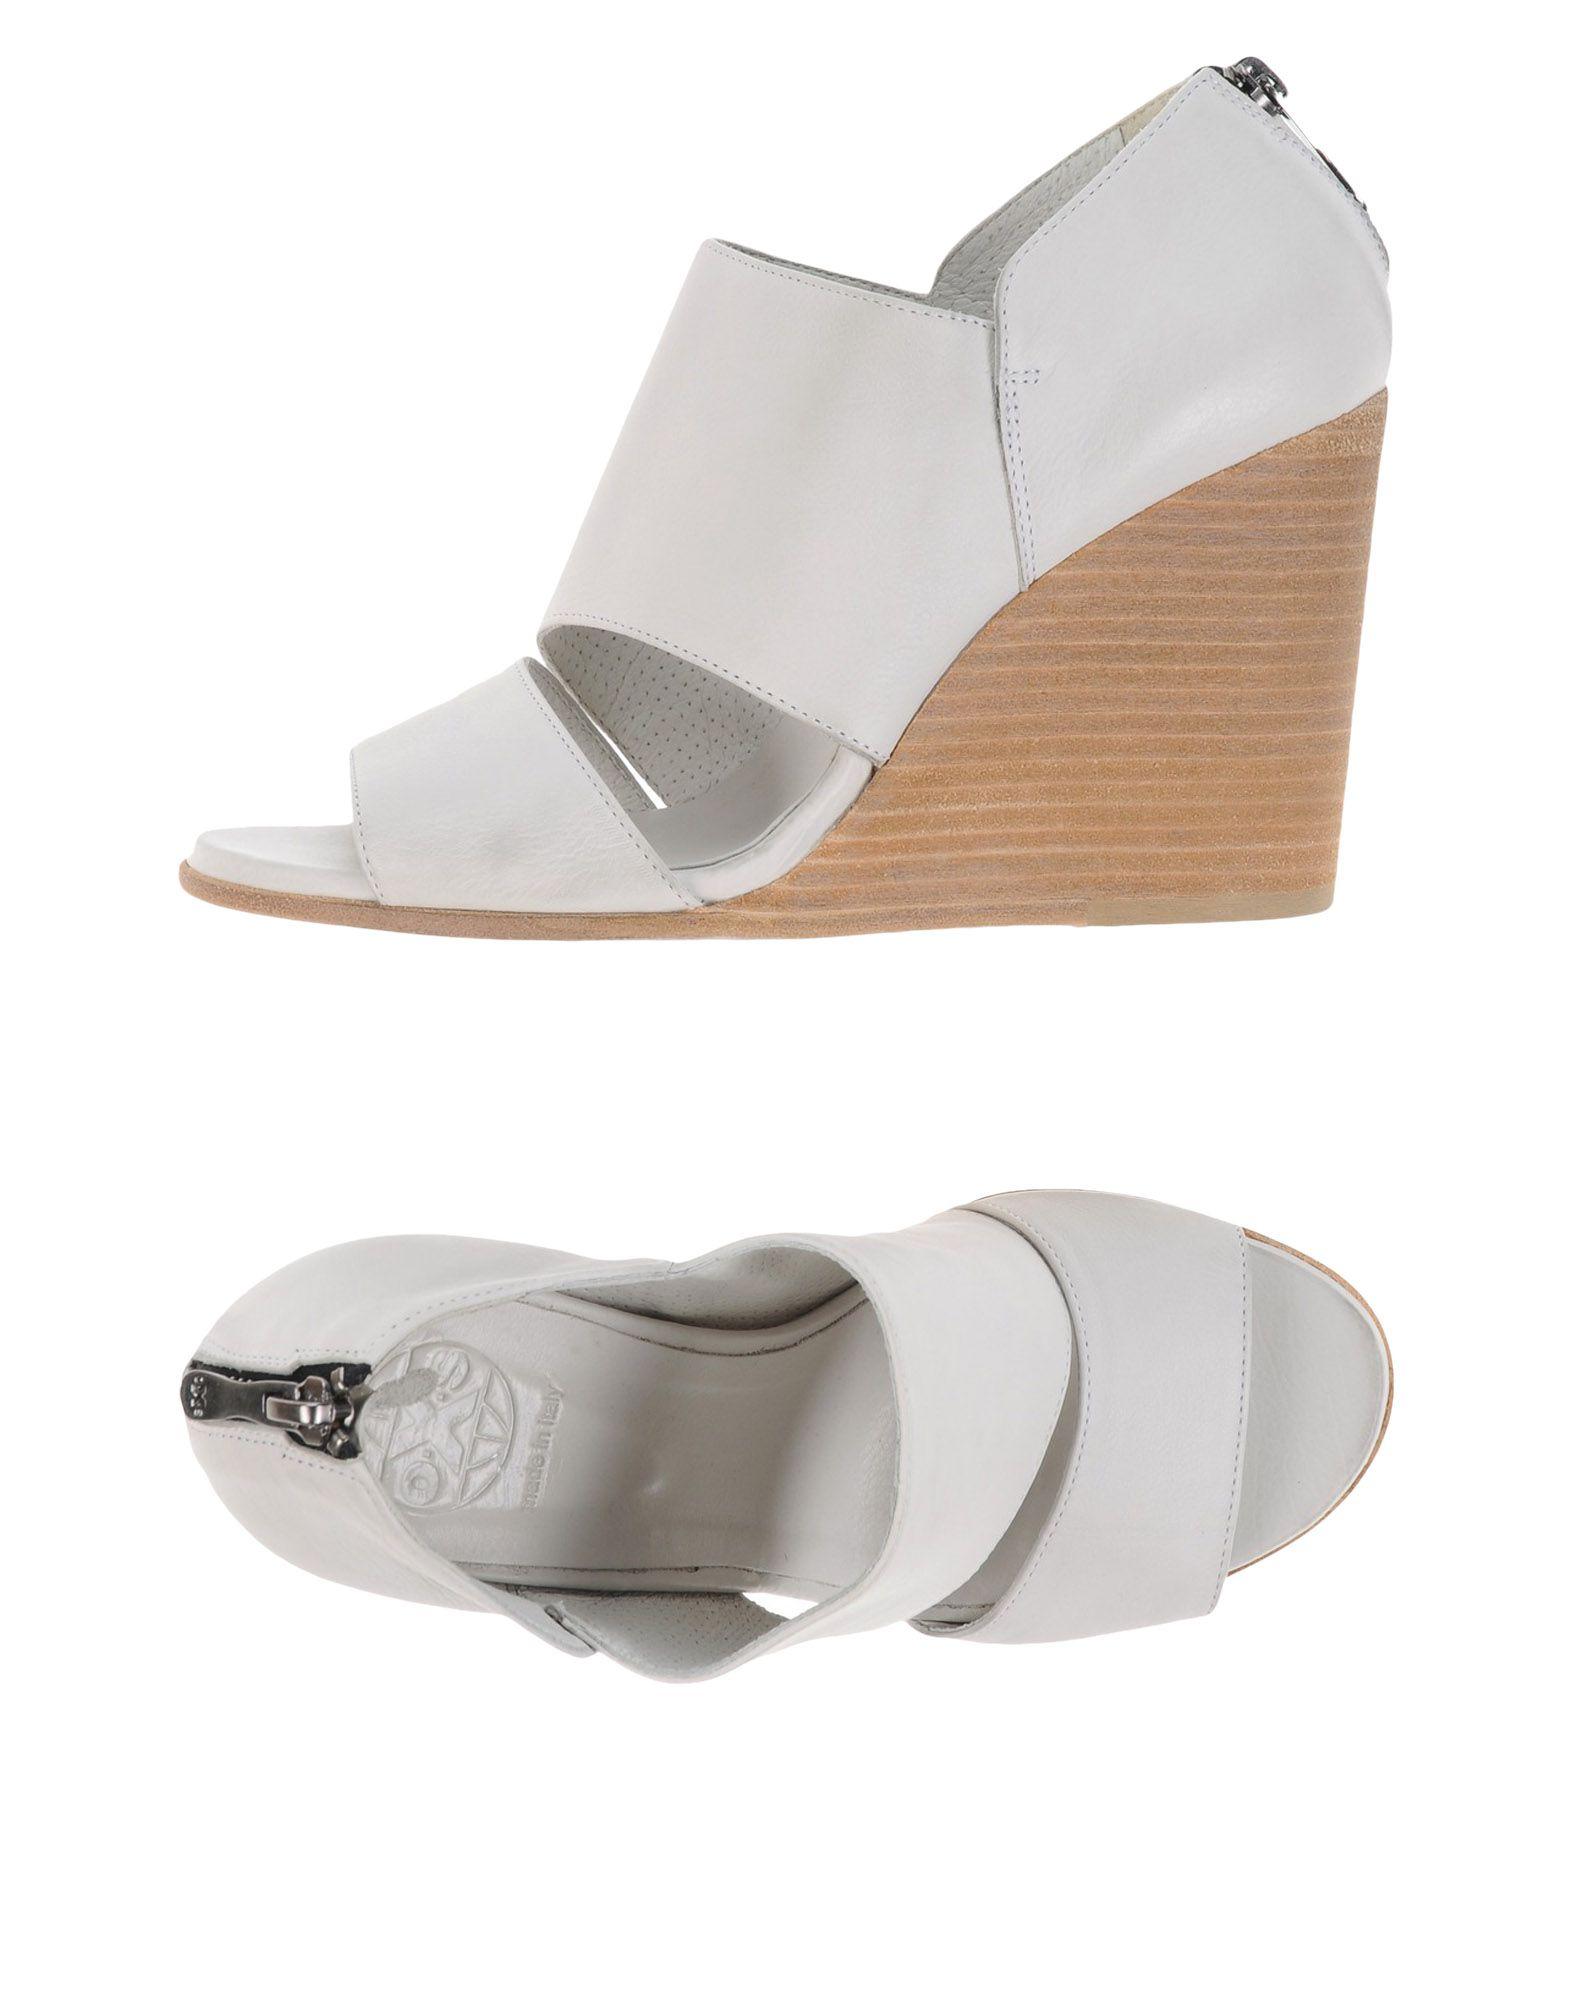 Sandales O.X.S. Femme - Sandales O.X.S. sur